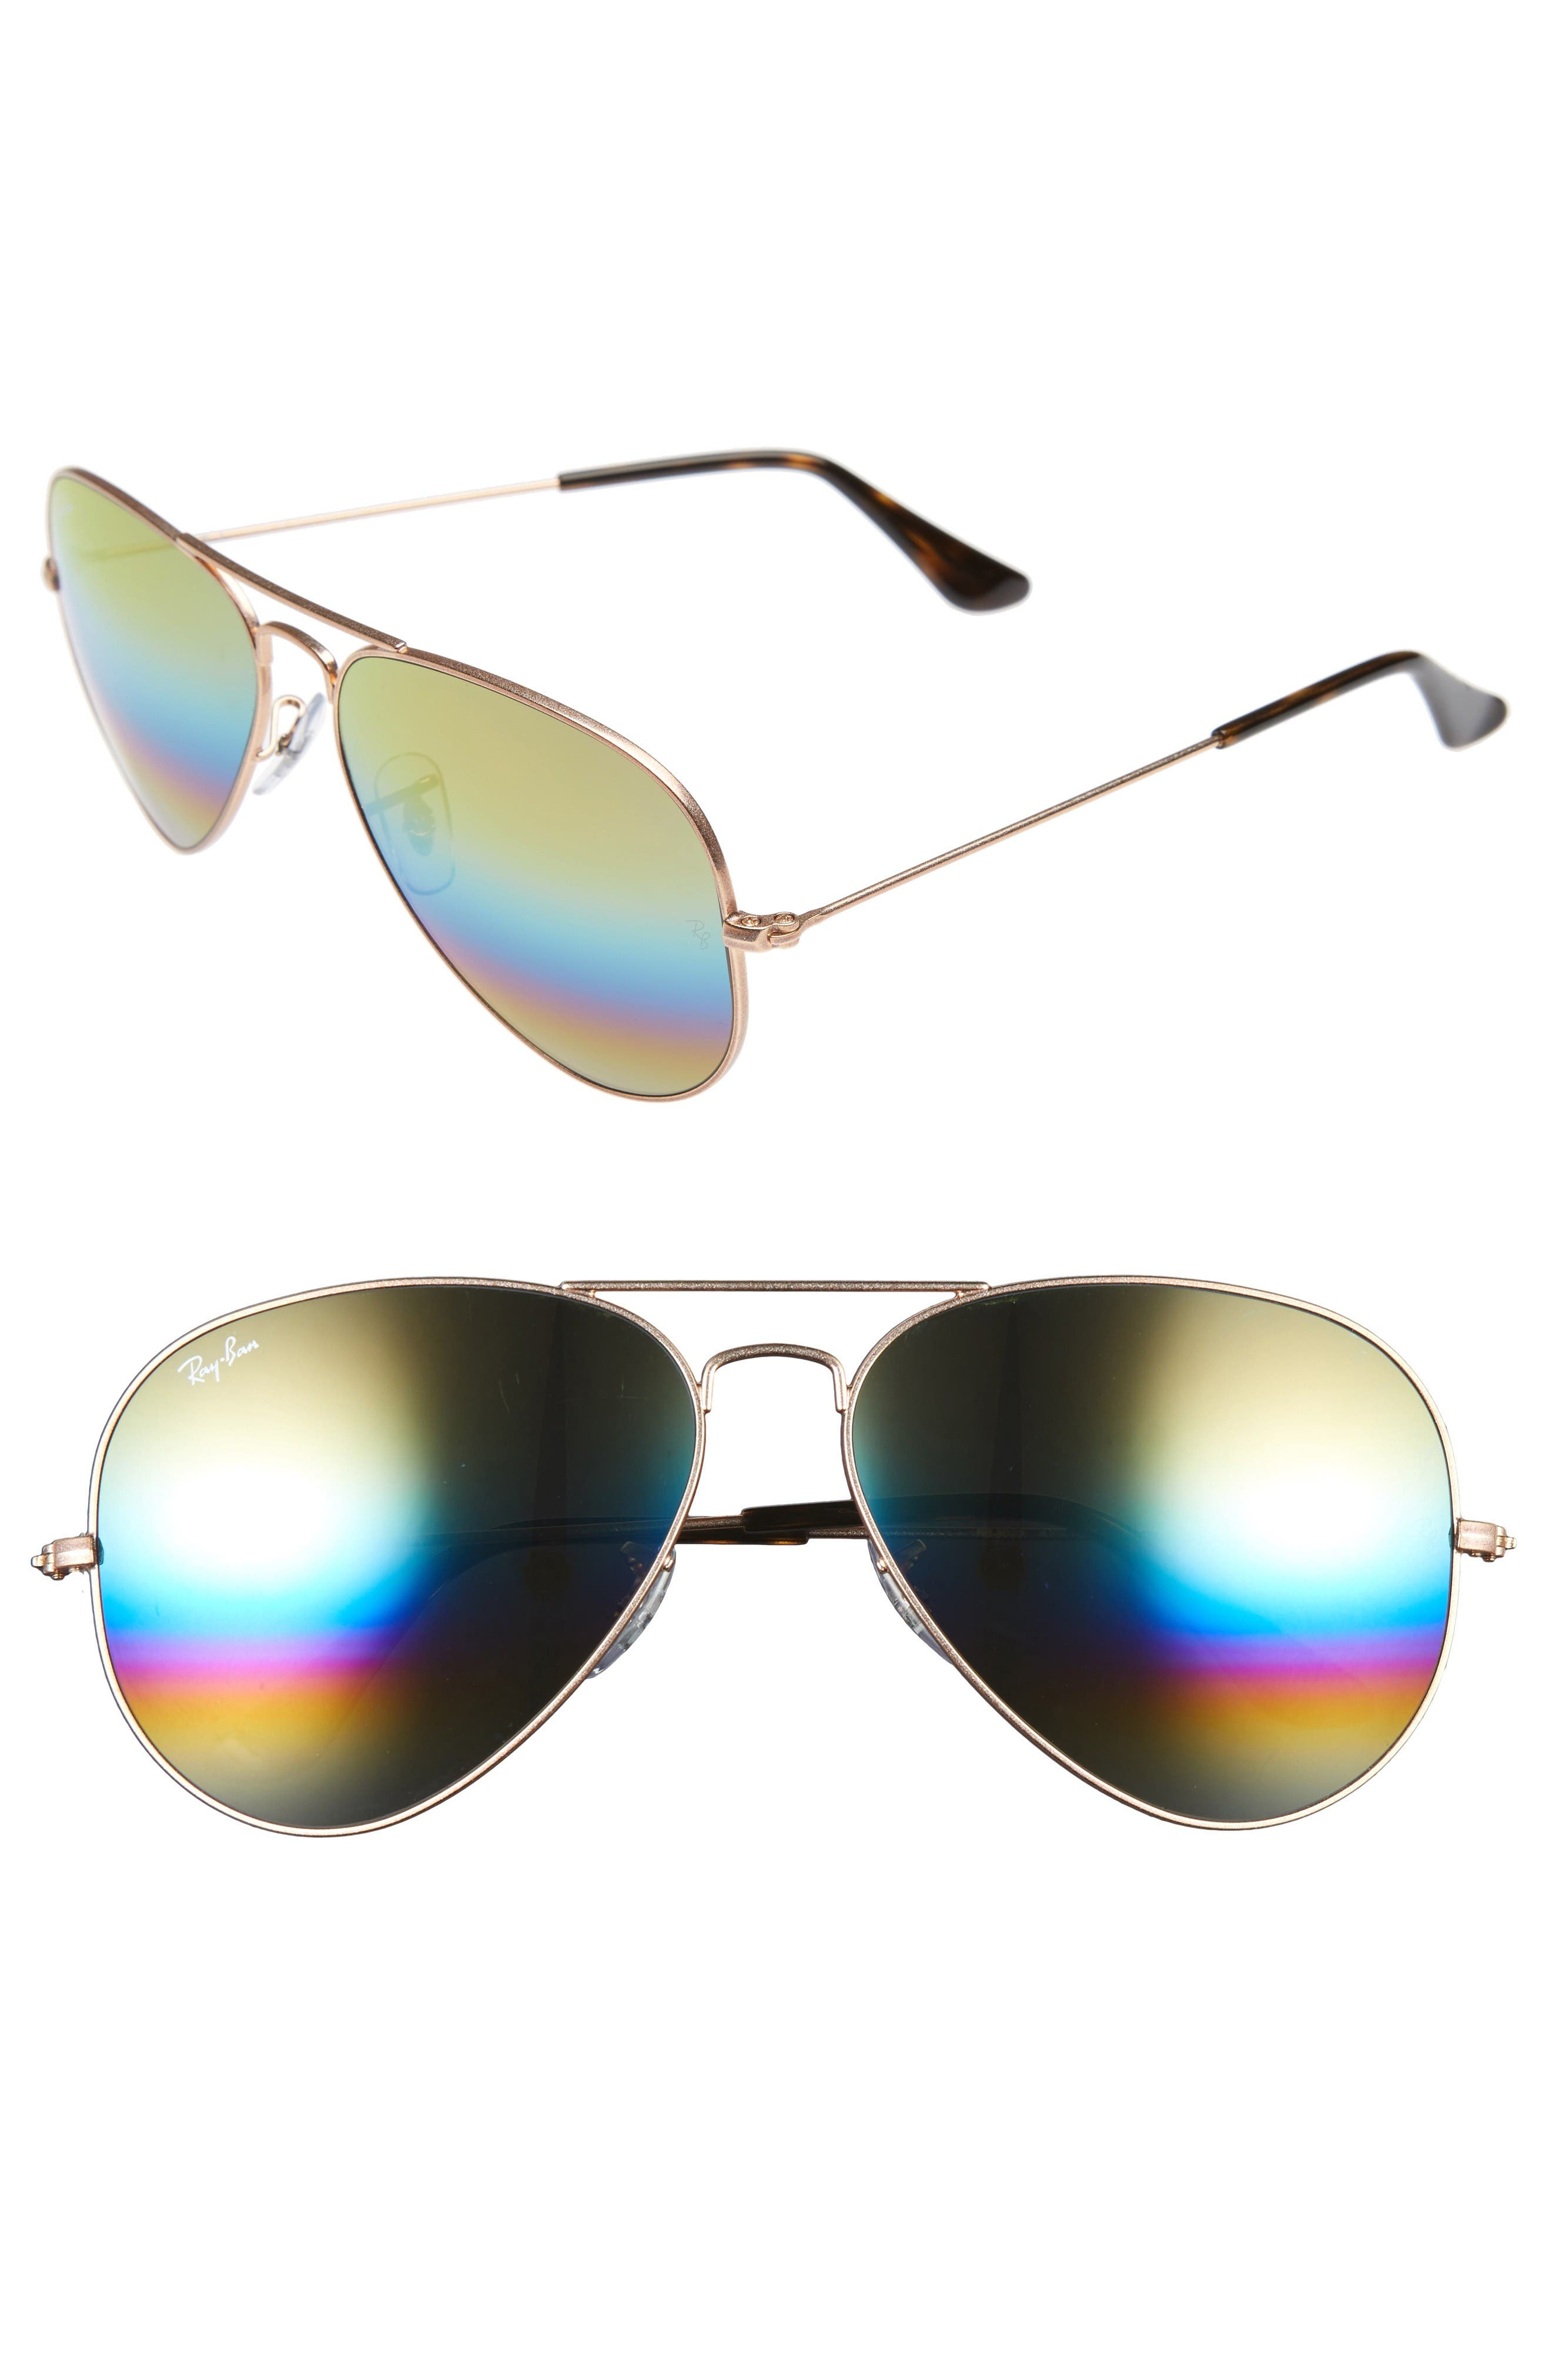 Alternate Image 1 Selected - Ray-Ban Standard Icons 58mm Mirrored Rainbow Aviator Sunglasses